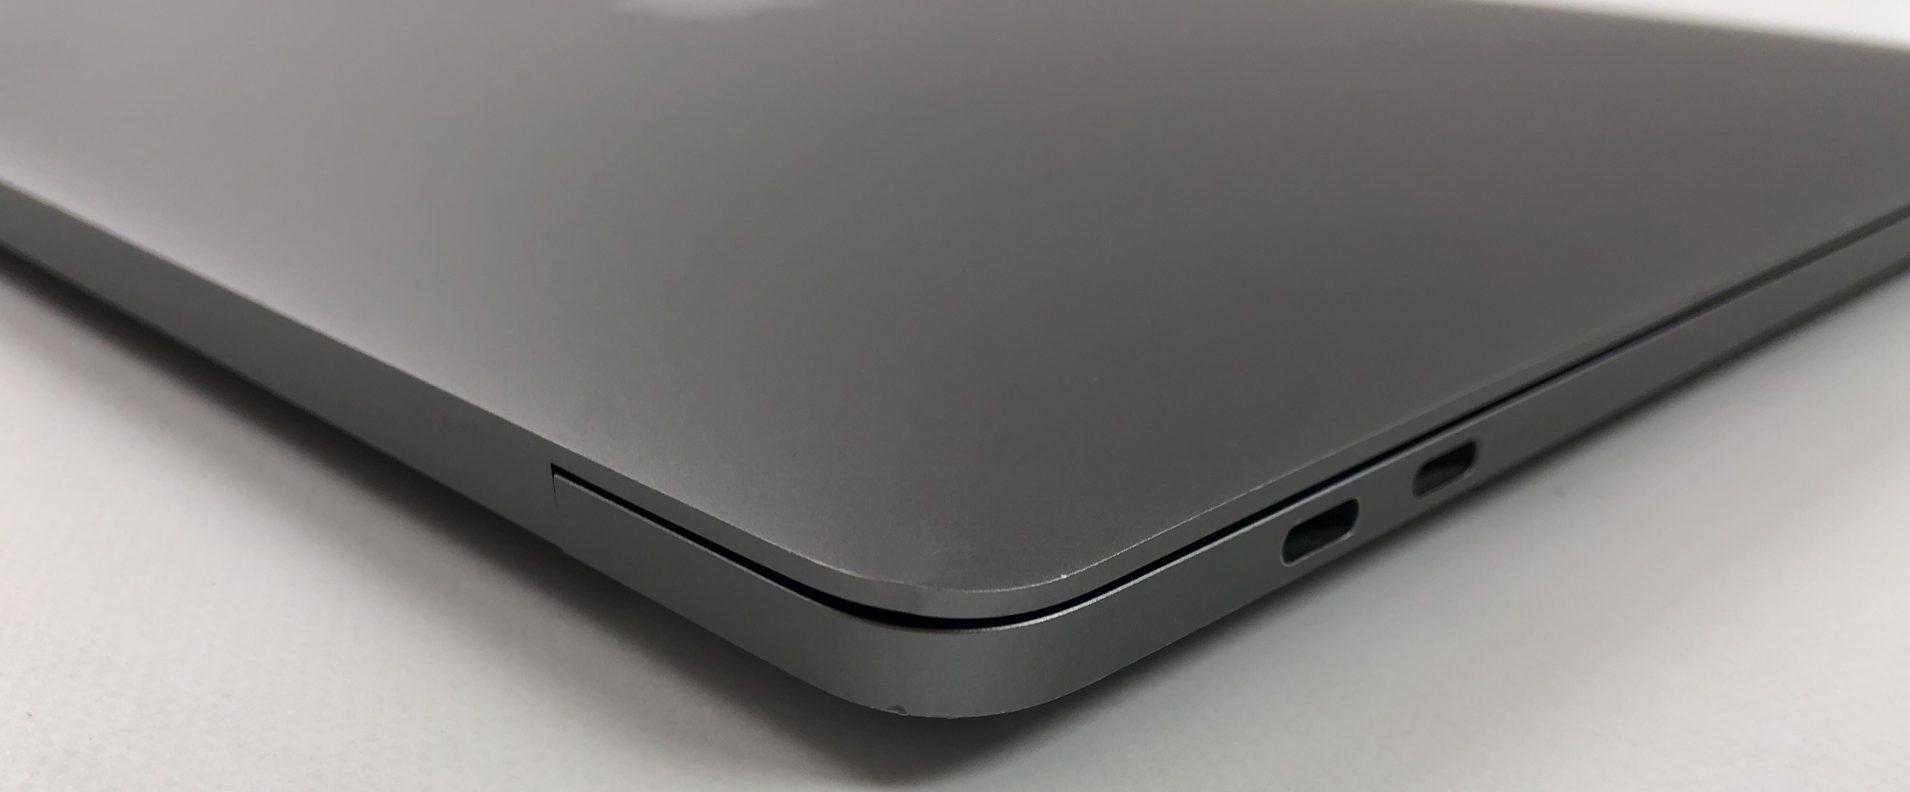 "MacBook Pro 15"" Touch Bar Late 2016 (Intel Quad-Core i7 2.9 GHz 16 GB RAM 512 GB SSD), Space Gray, Intel Quad-Core i7 2.9 GHz, 16 GB RAM, 512 GB SSD, Kuva 6"